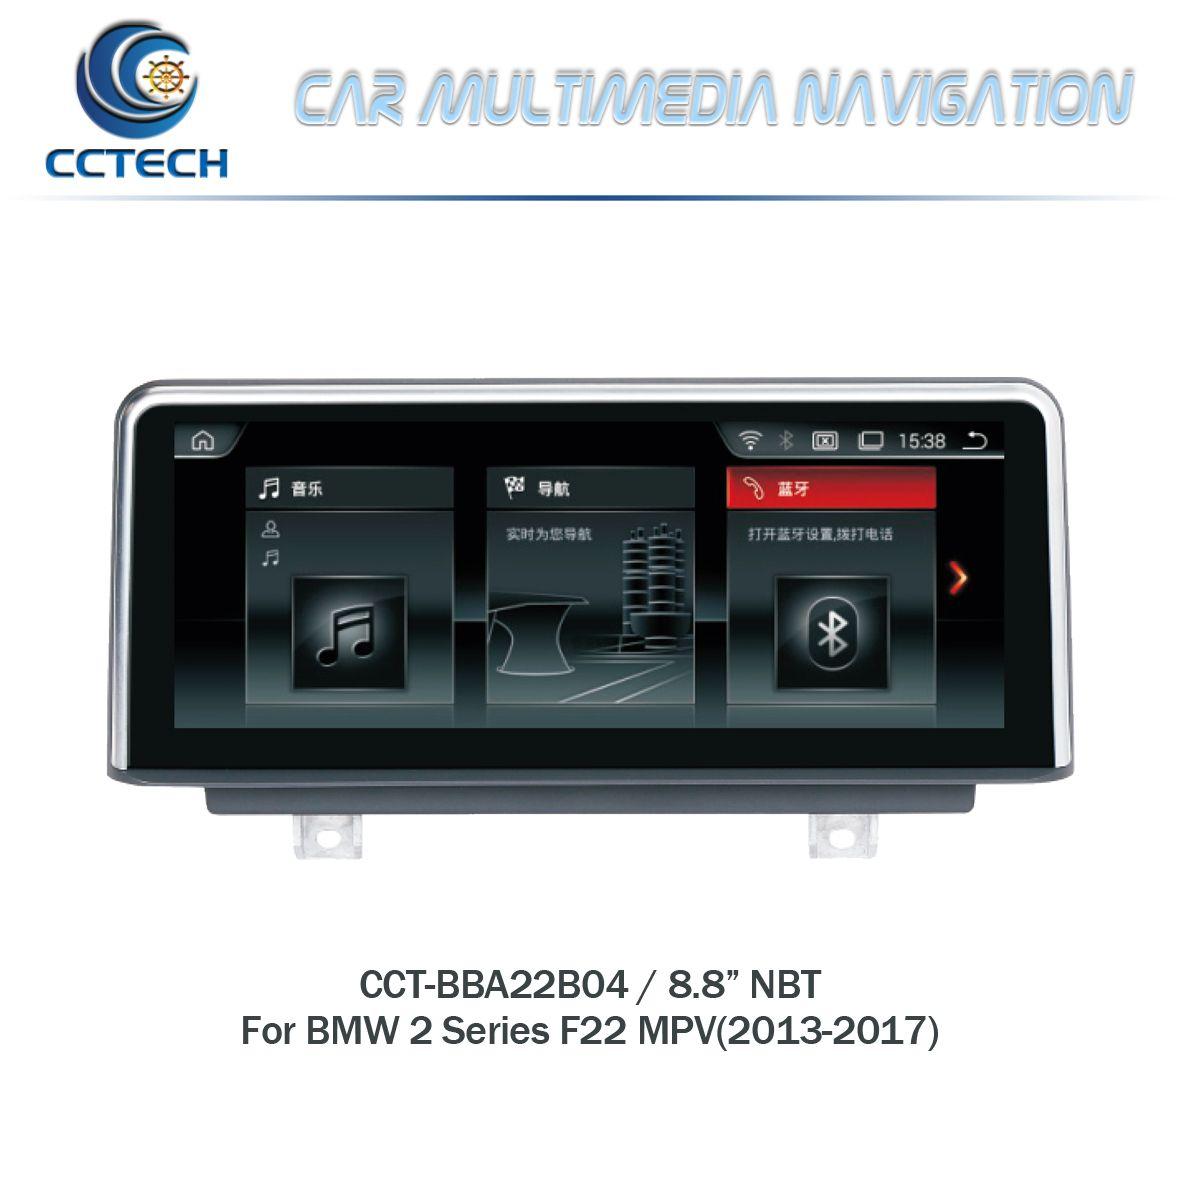 04 88 inch for bmw 2 series f22 mpv2013 2017 nbt bmw car 04 88 inch for bmw 2 series f22 mpv2013 2017 nbt altavistaventures Images